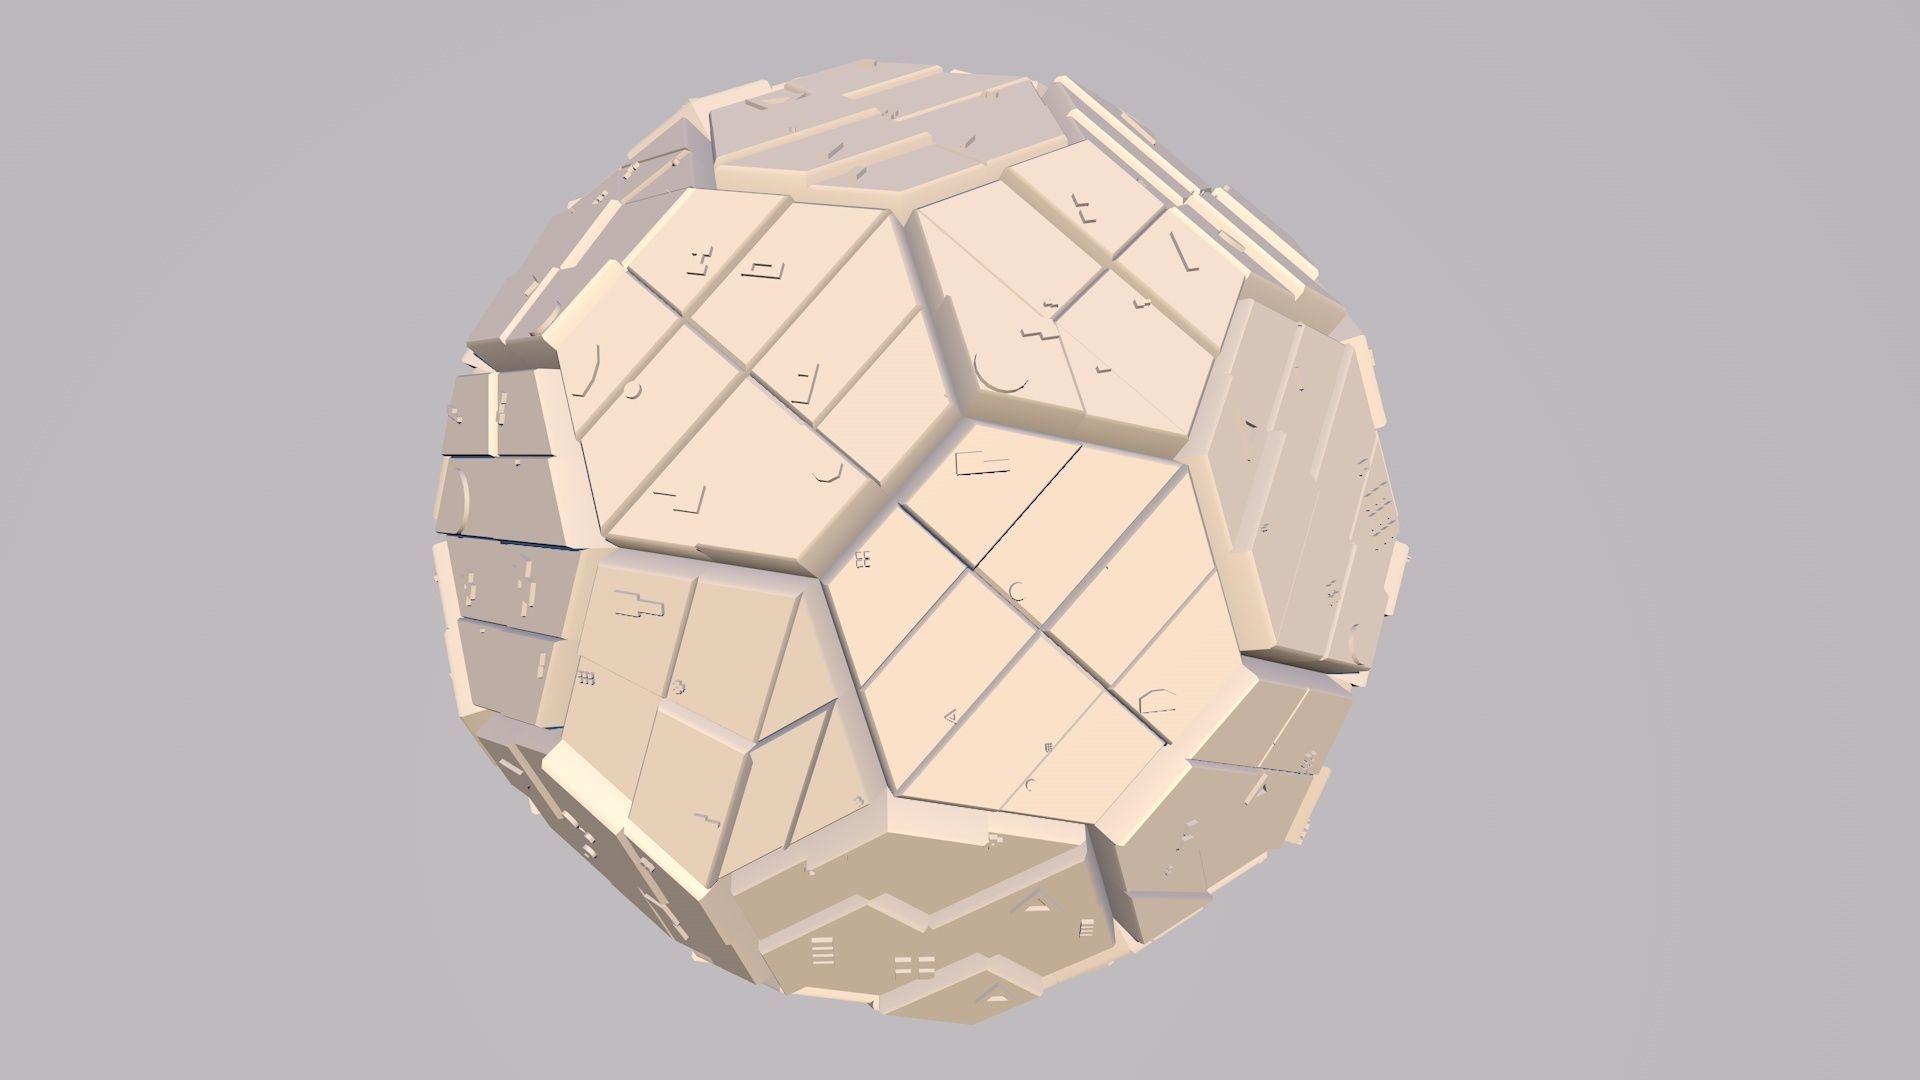 Sphere Scifi Object No 1 Cinema 4D FBX OBJ MTL STL 3DS | 3D model